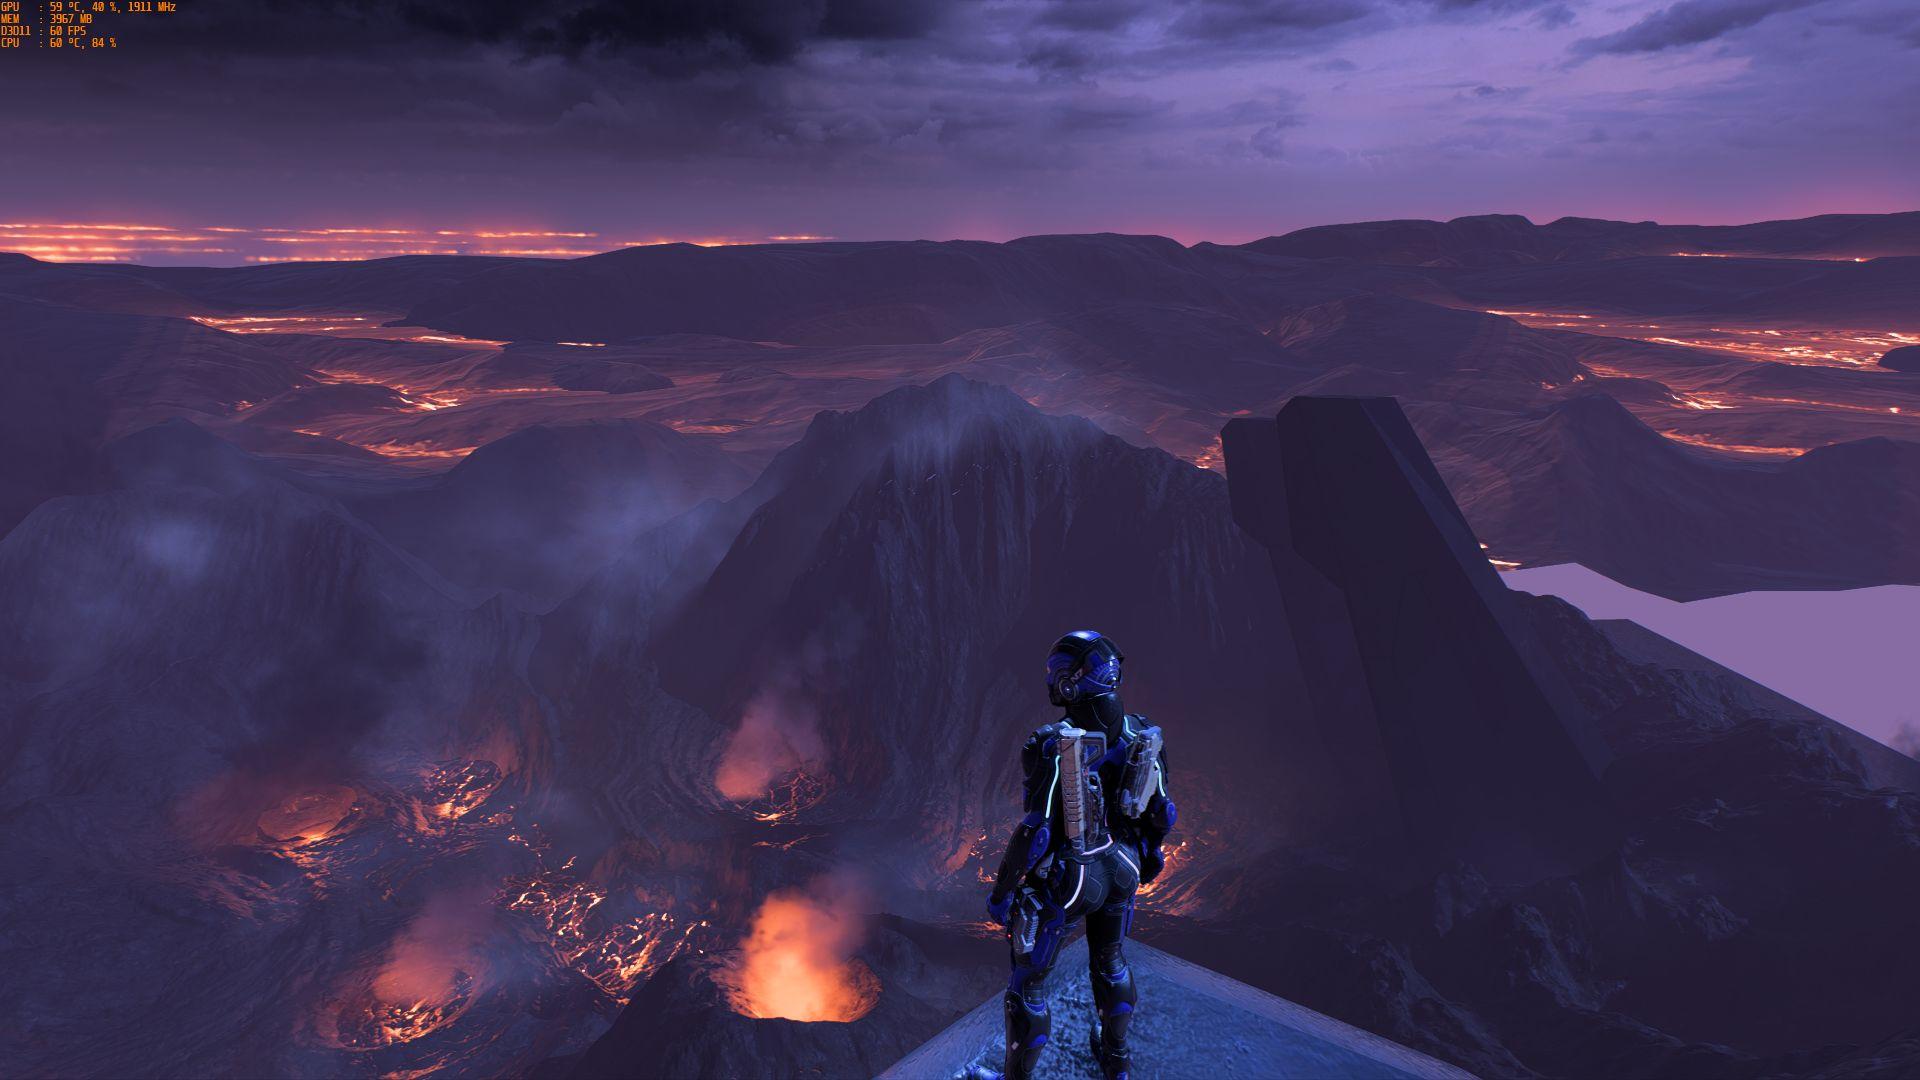 Mass Effect Andromeda Screenshot 2017.07.30 - 20.06.08.22.jpg - Mass Effect: Andromeda